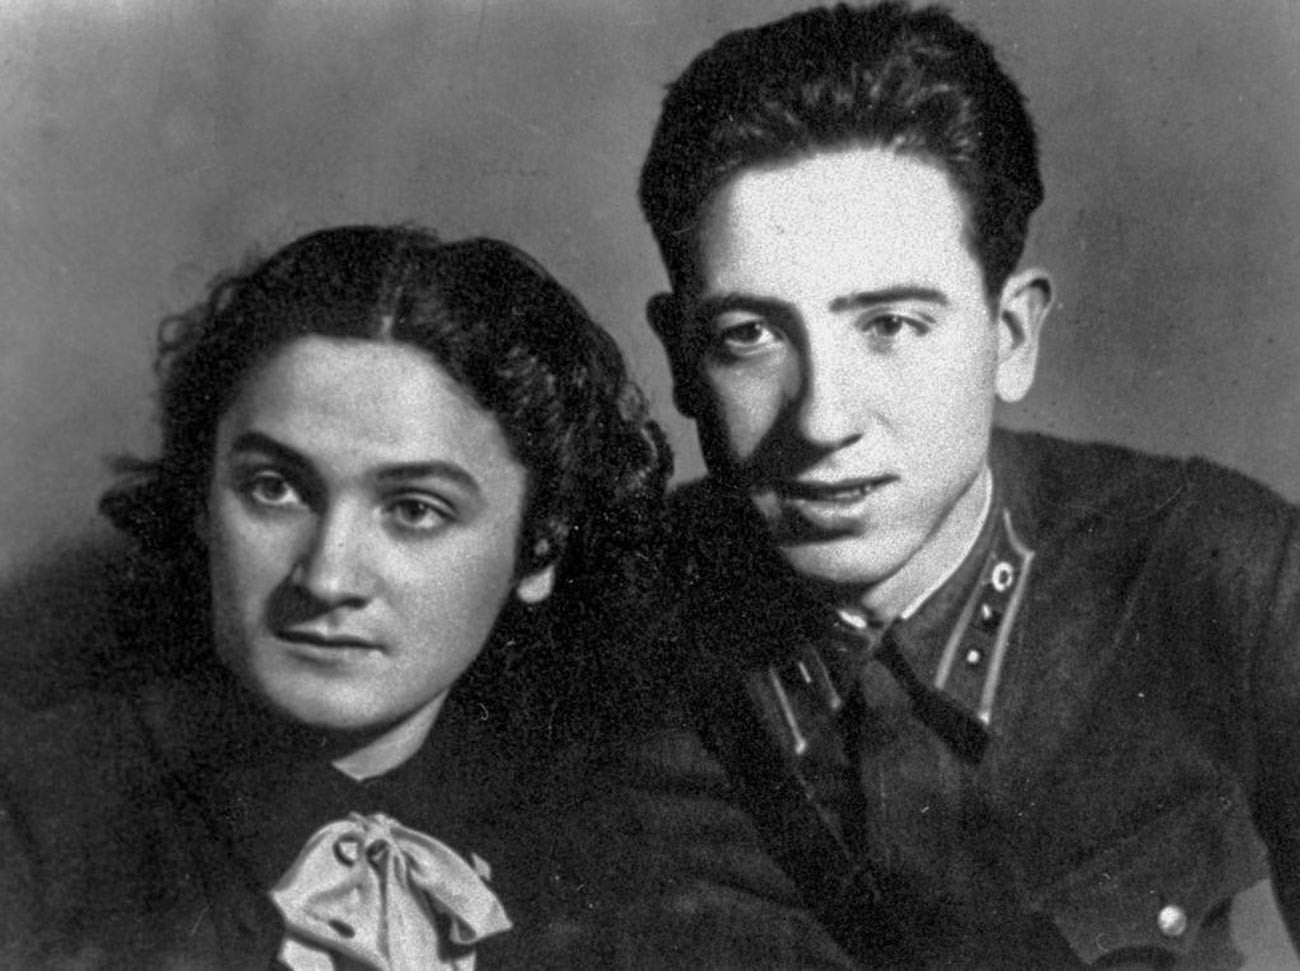 Rubén Ruiz Ibárruri with his sister Amaya.